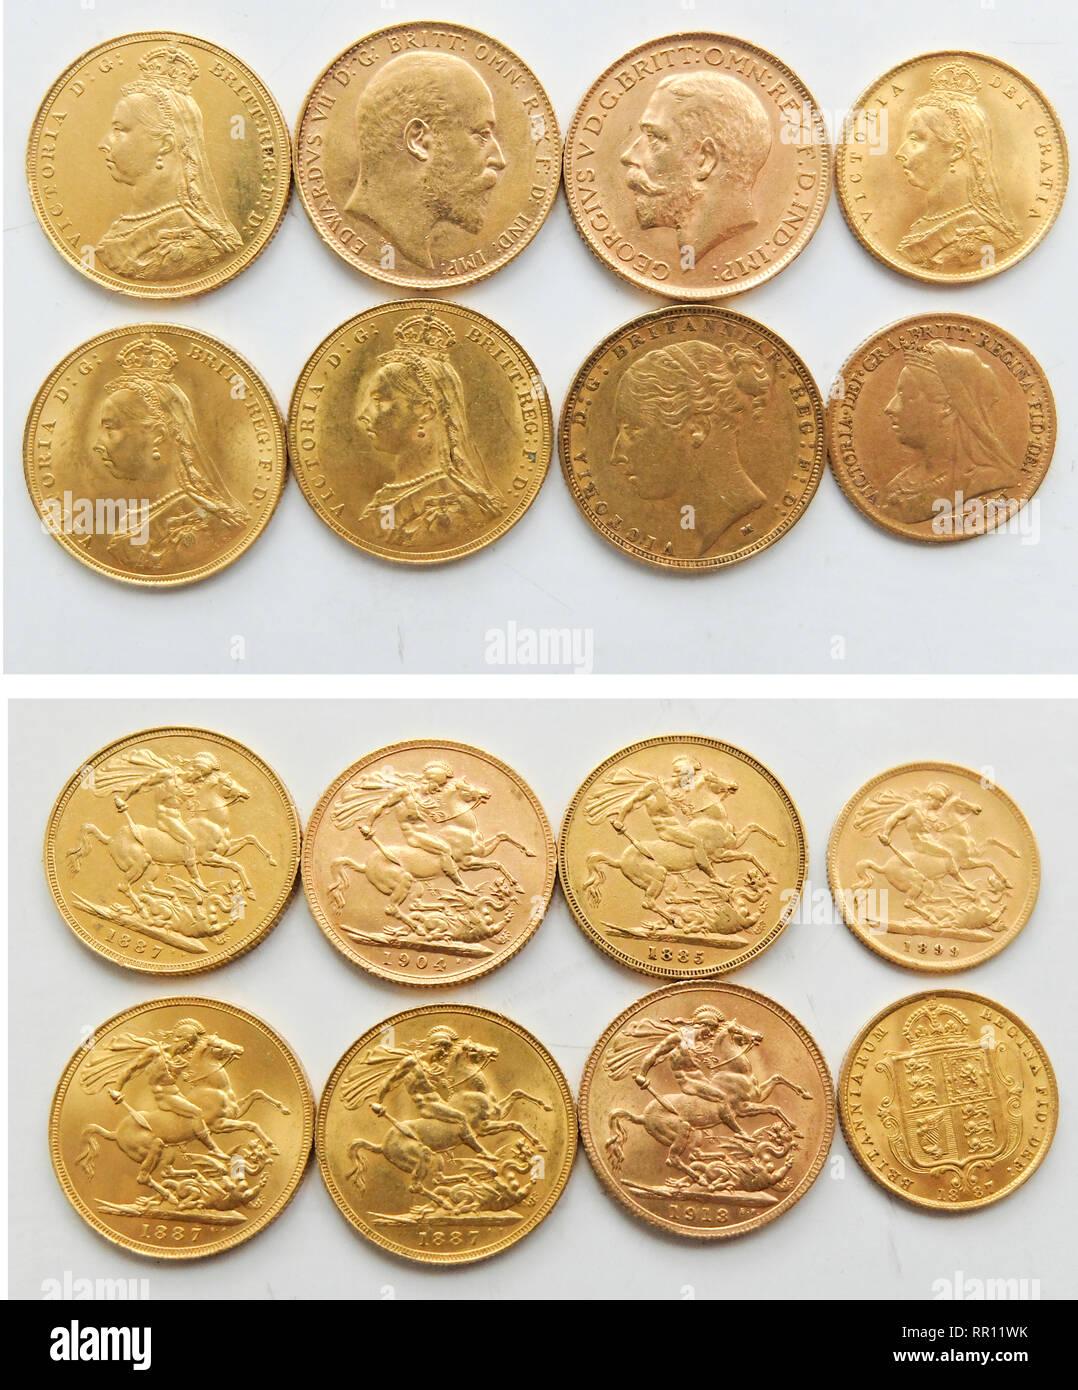 Victorian Coins Crown Stock Photos & Victorian Coins Crown Stock